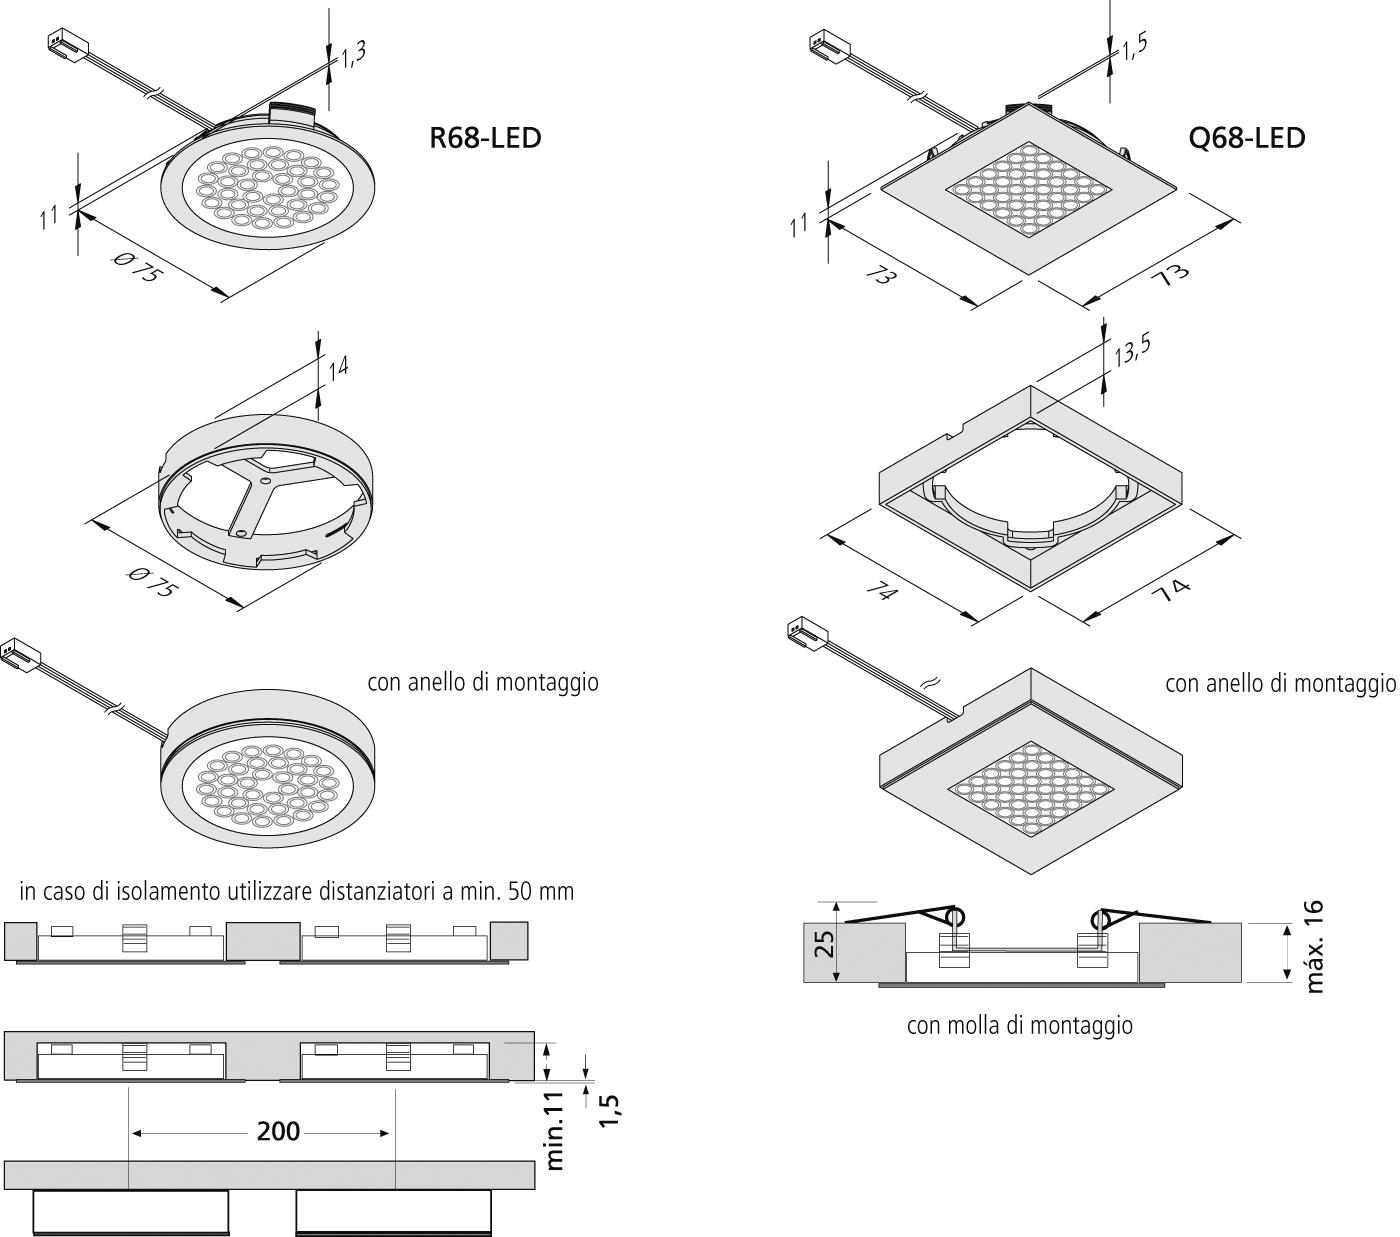 Anteprima: R68-LED-_-Q68-LED_it